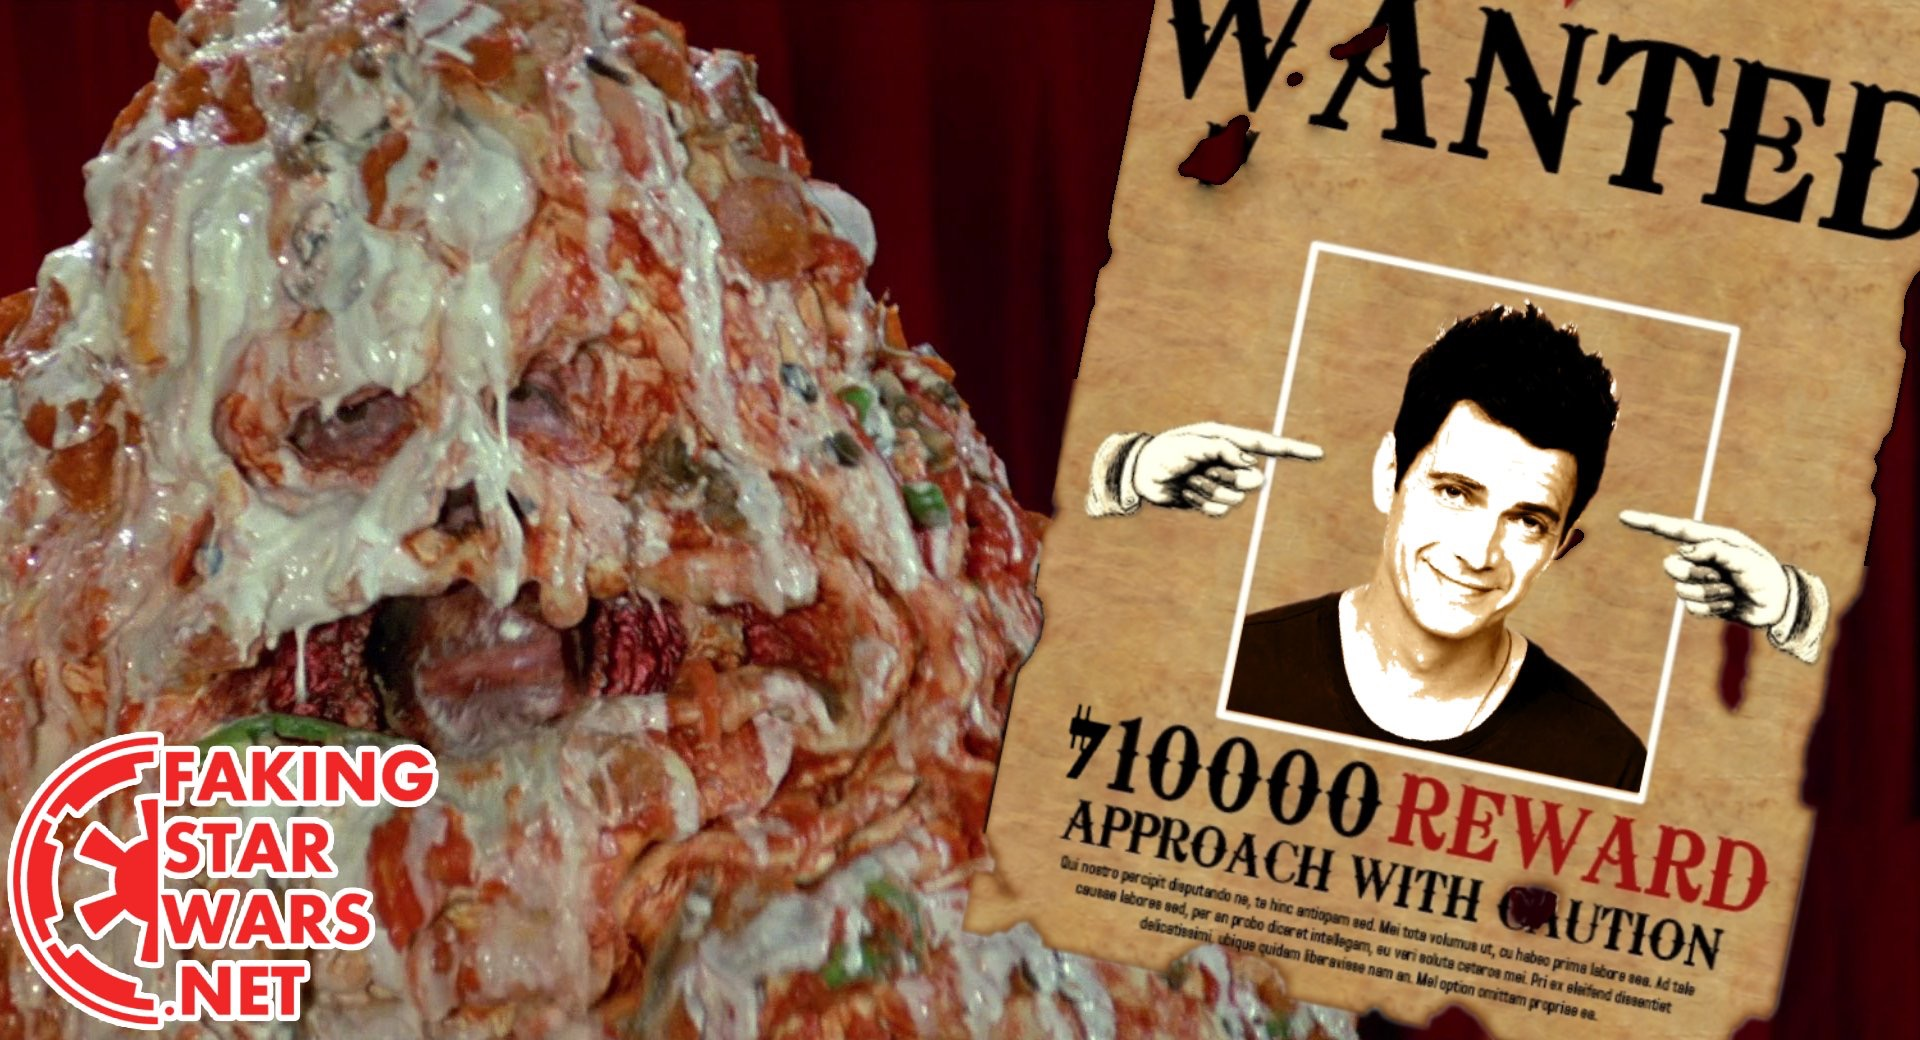 Pizza The Hut Issues Bounty On Hayden Christensen Over